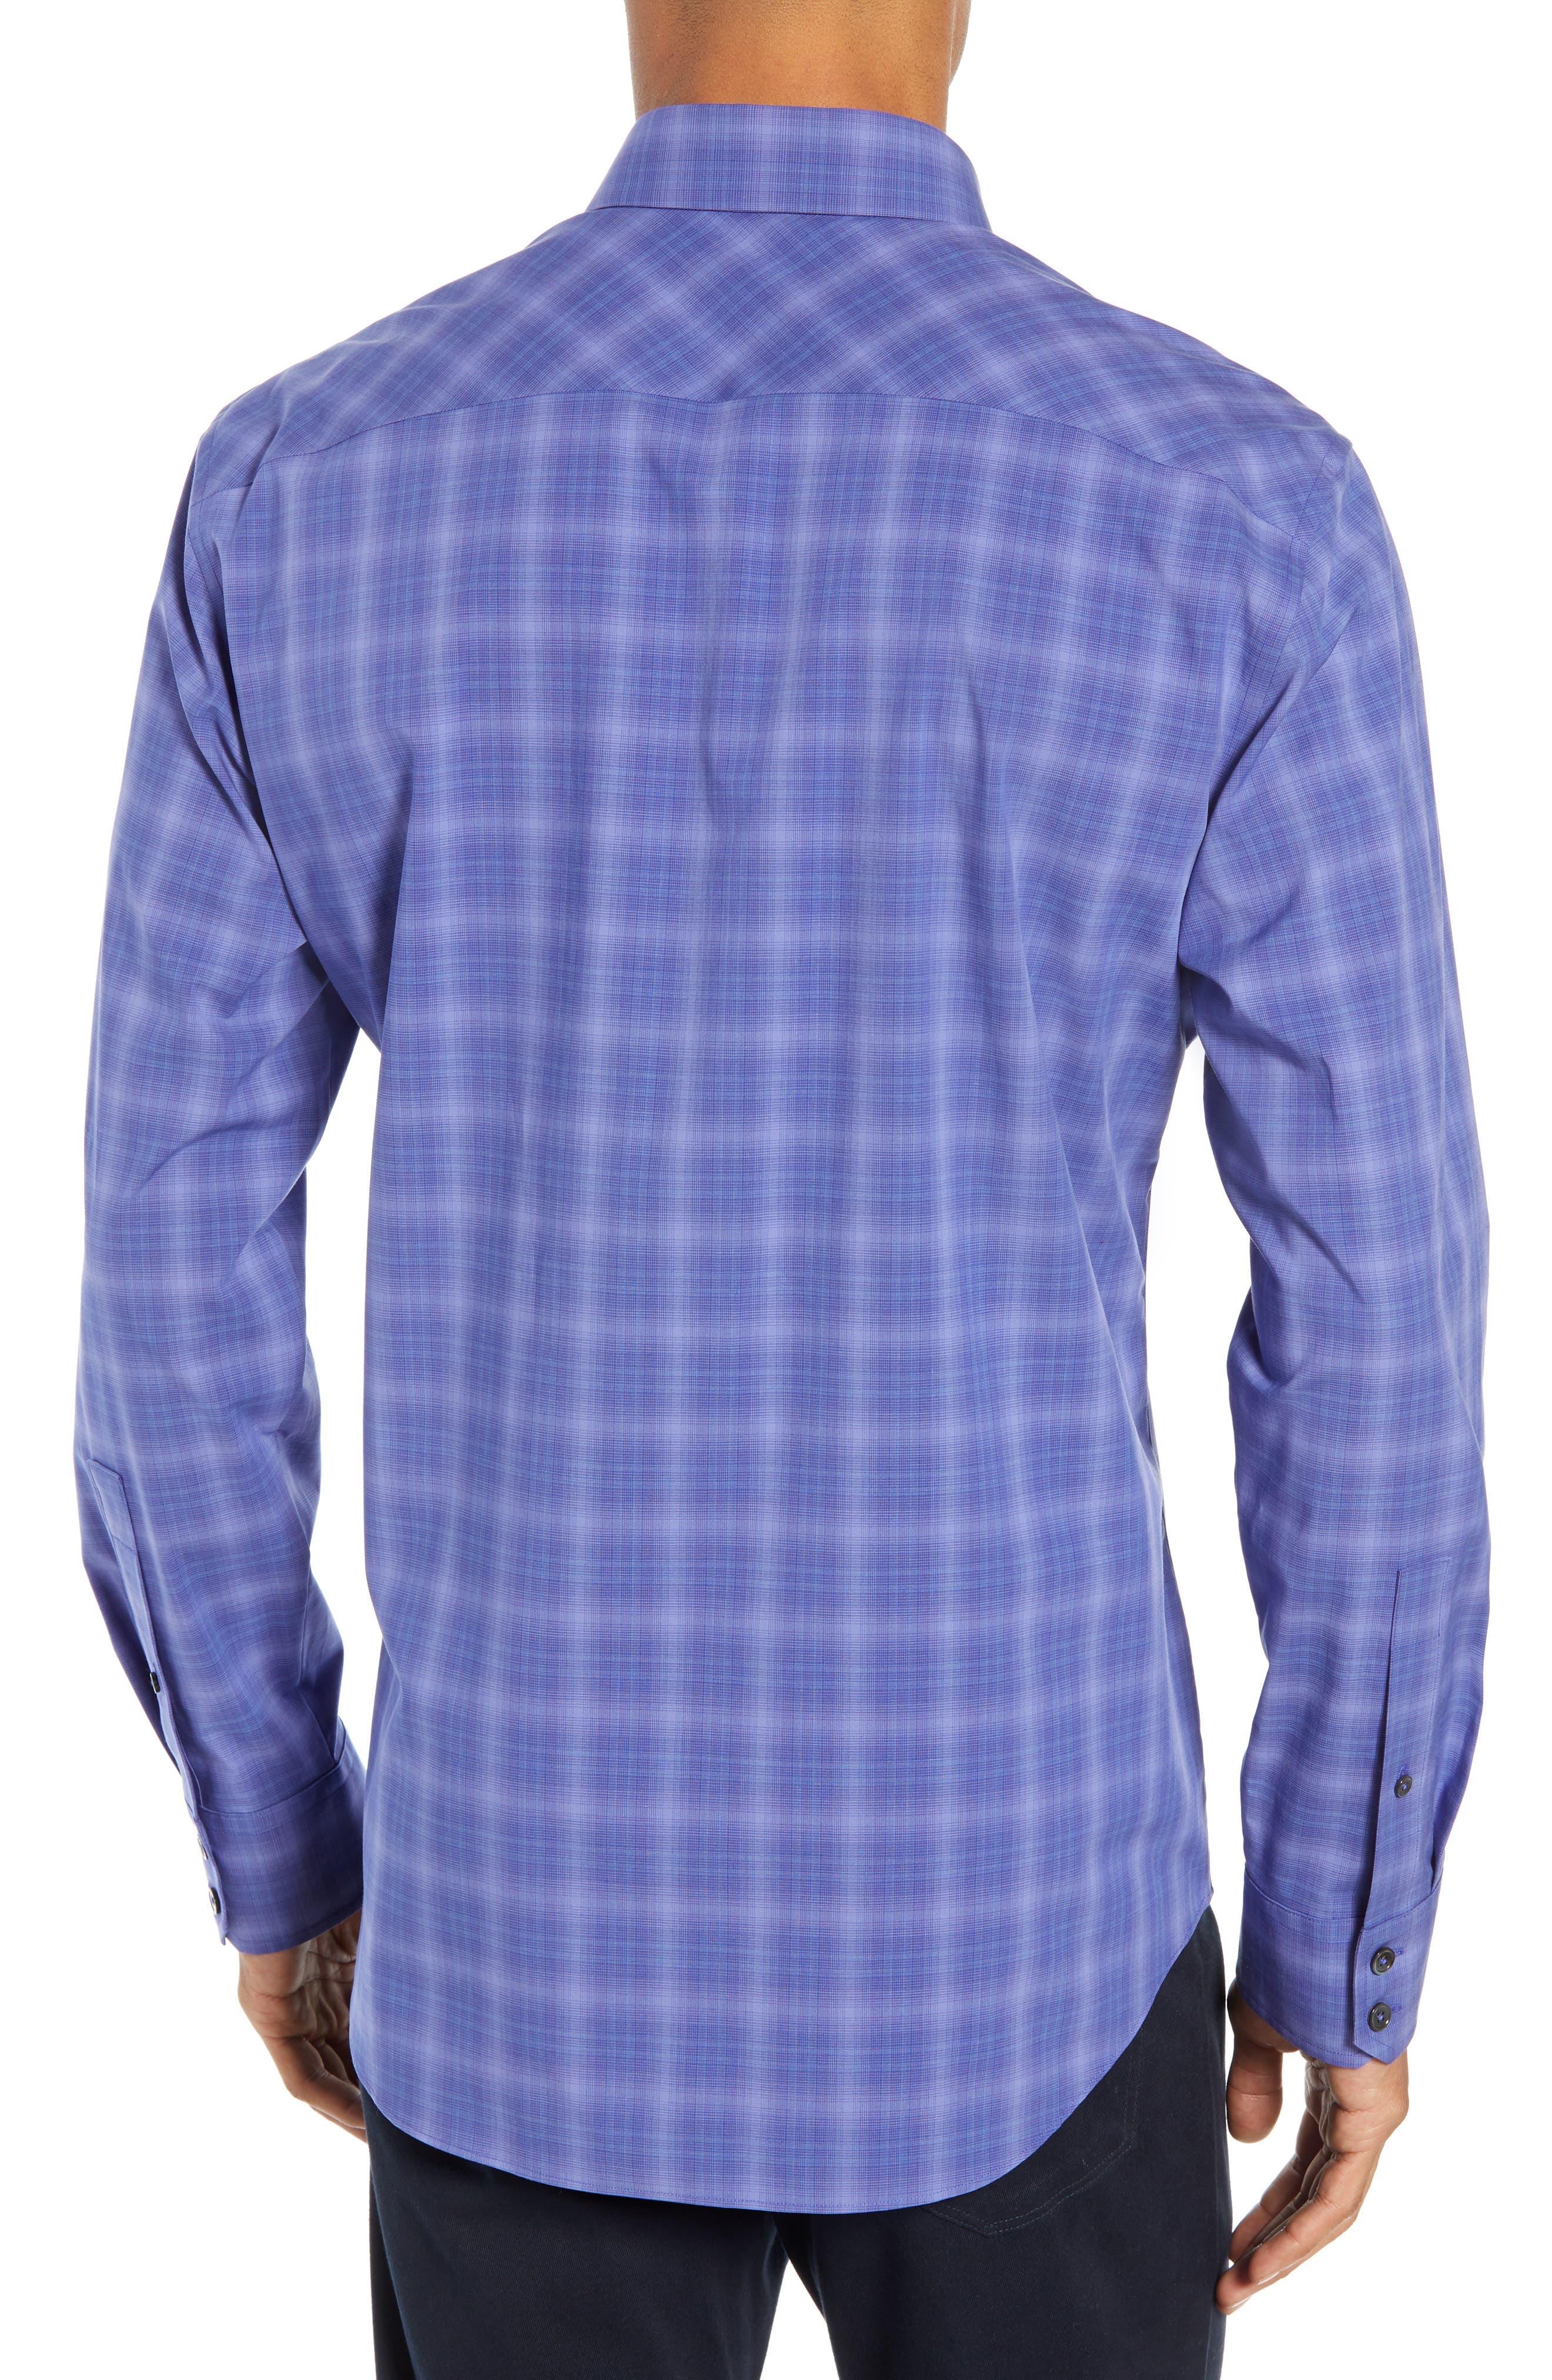 ZACHARY PRELL, Wandy Regular Fit Check Sport Shirt, Alternate thumbnail 3, color, LIGHT PURPLE